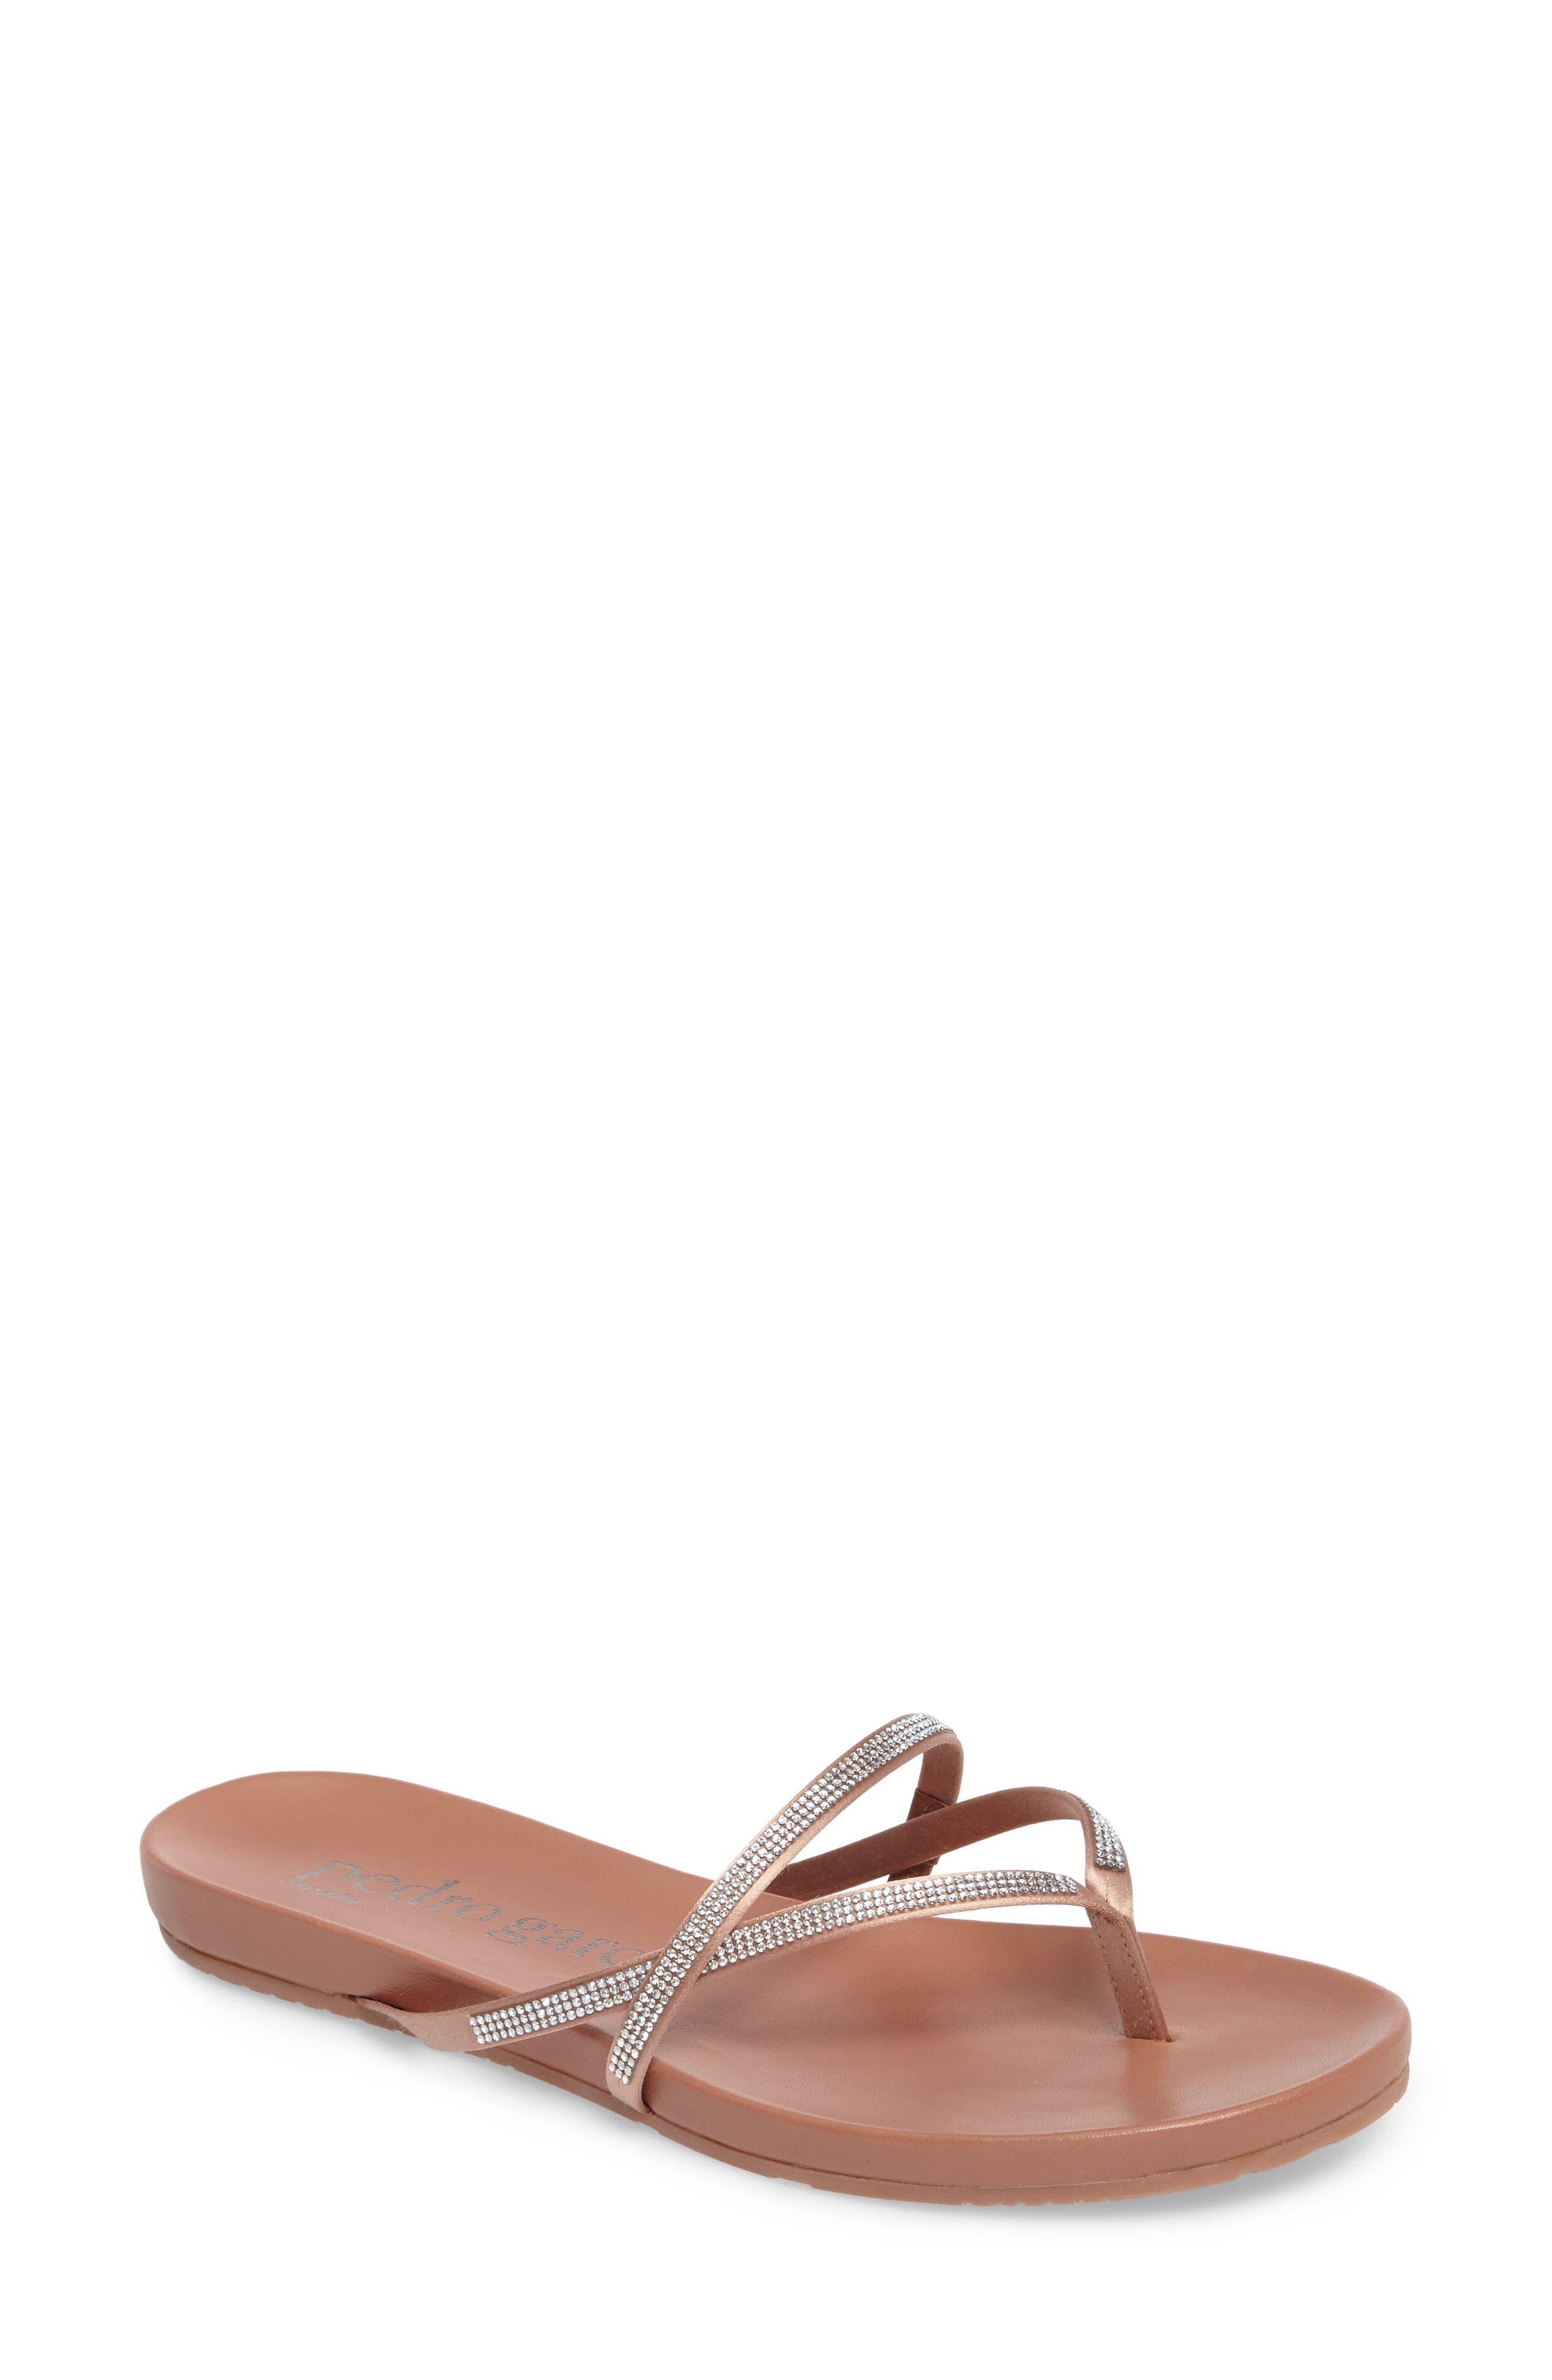 Giulia Crystal Embellished Sandal,                             Main thumbnail 1, color,                             Bisque Satin